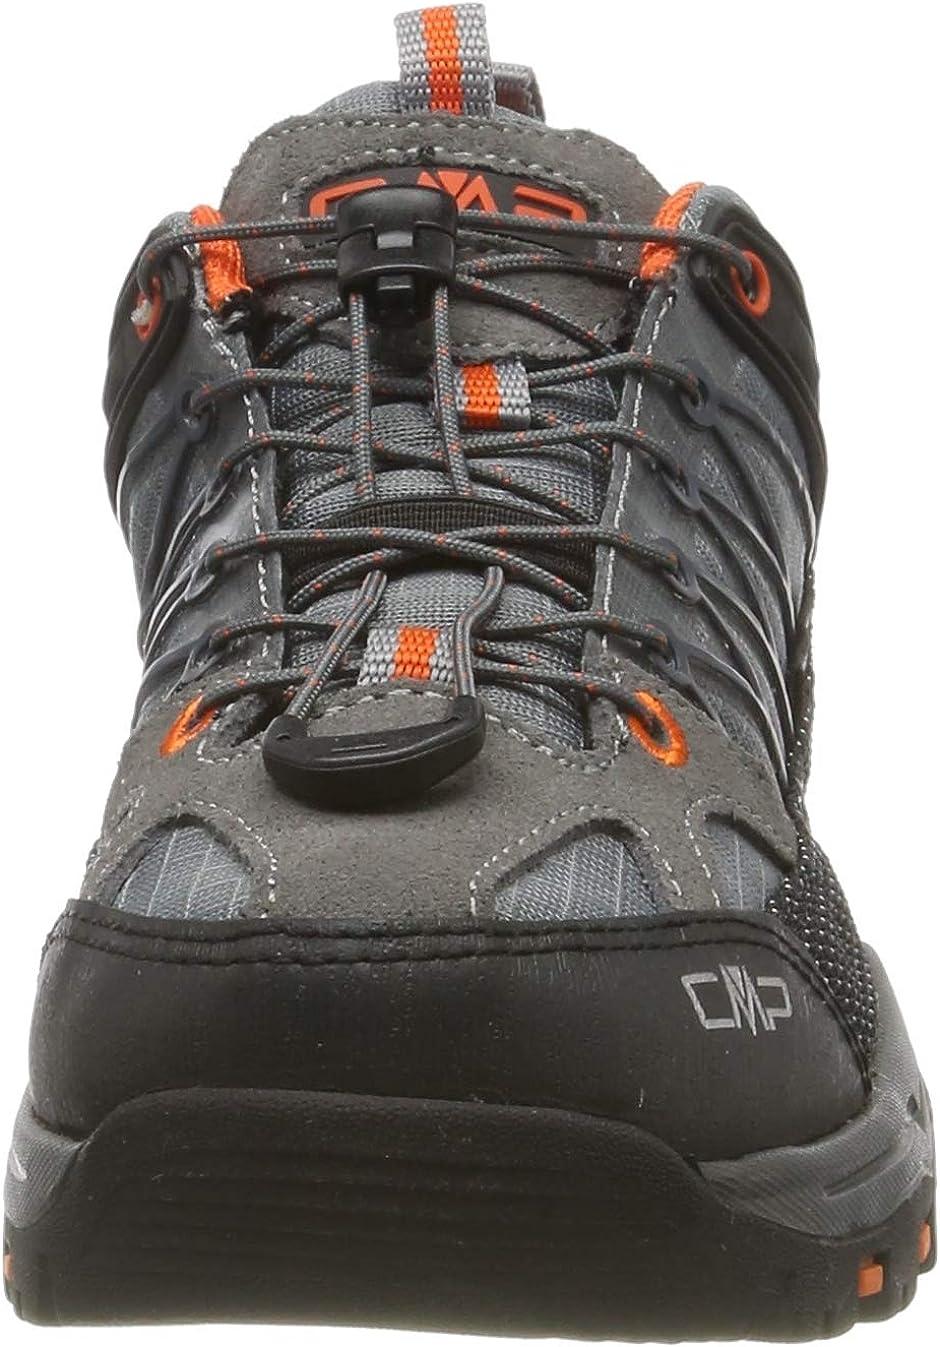 CMP Rigel Low Rise Hiking Shoes Grey Stone Orange 78uc